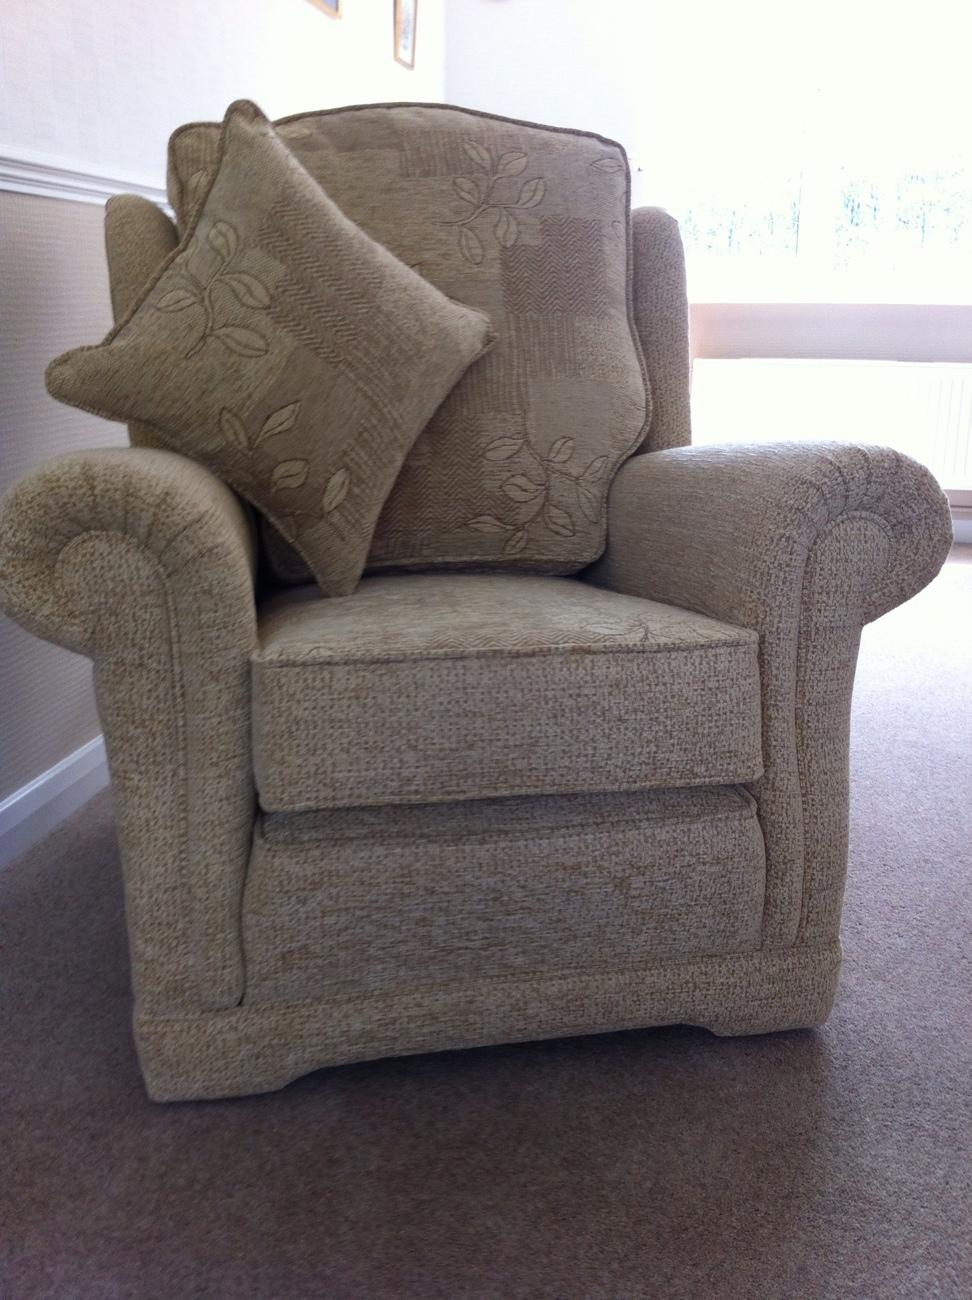 Ralvern Ascot chair Draylon chenille High Quality Upholstery Cannock Staffordshire Midlands Birmingham